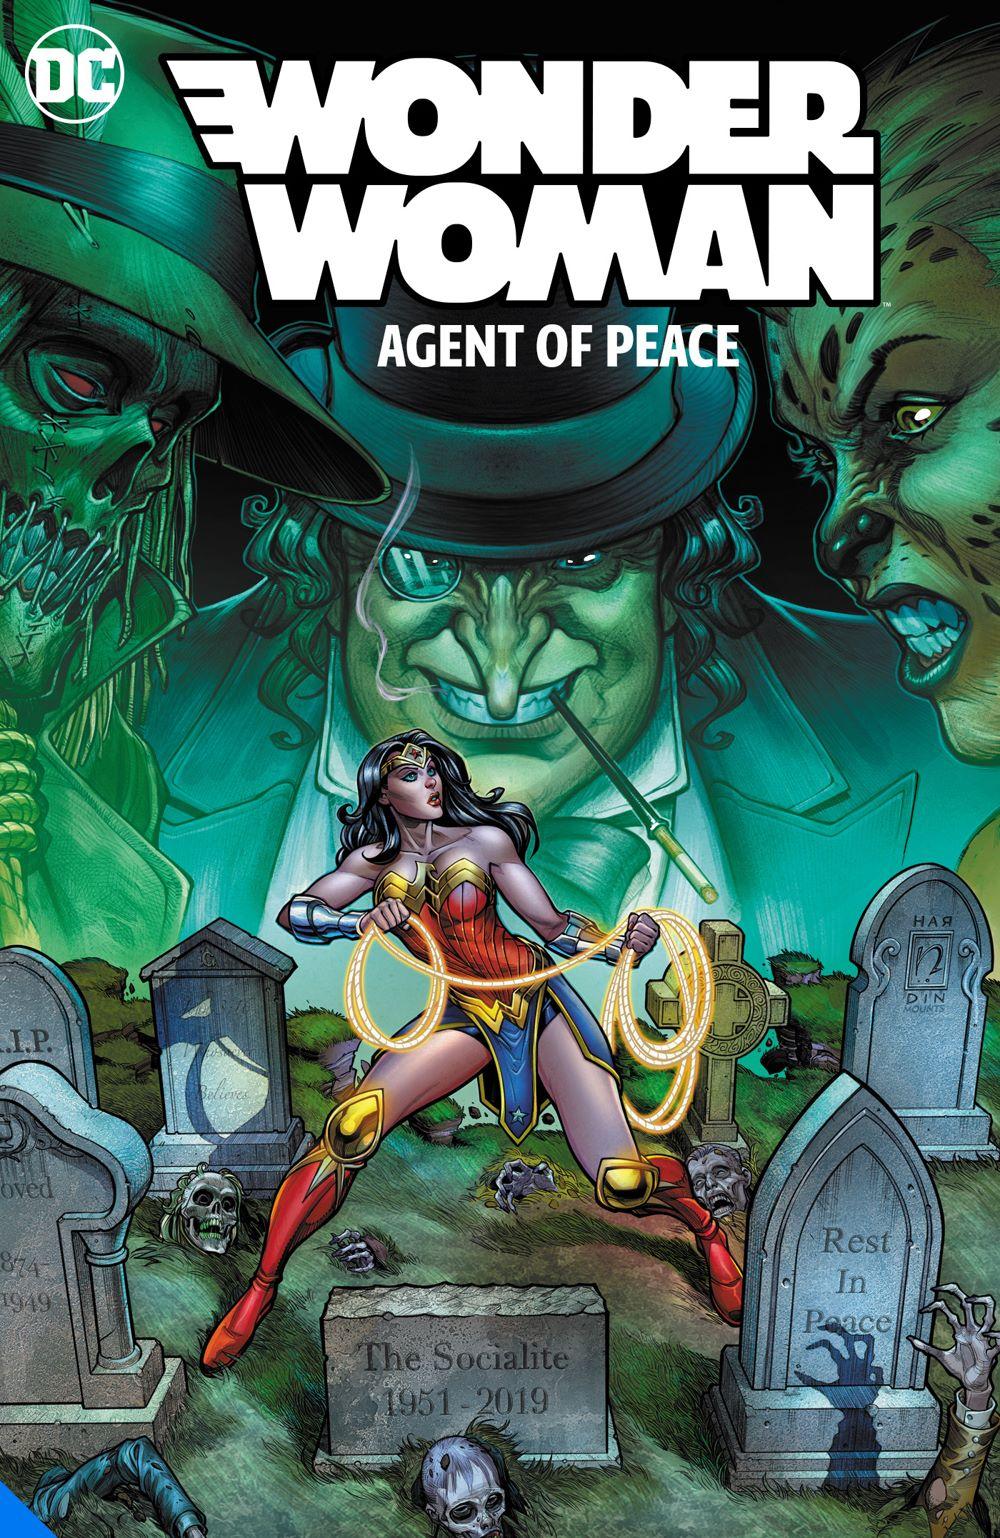 wonderwomanagentofpeace_adv DC Comics August 2021 Solicitations